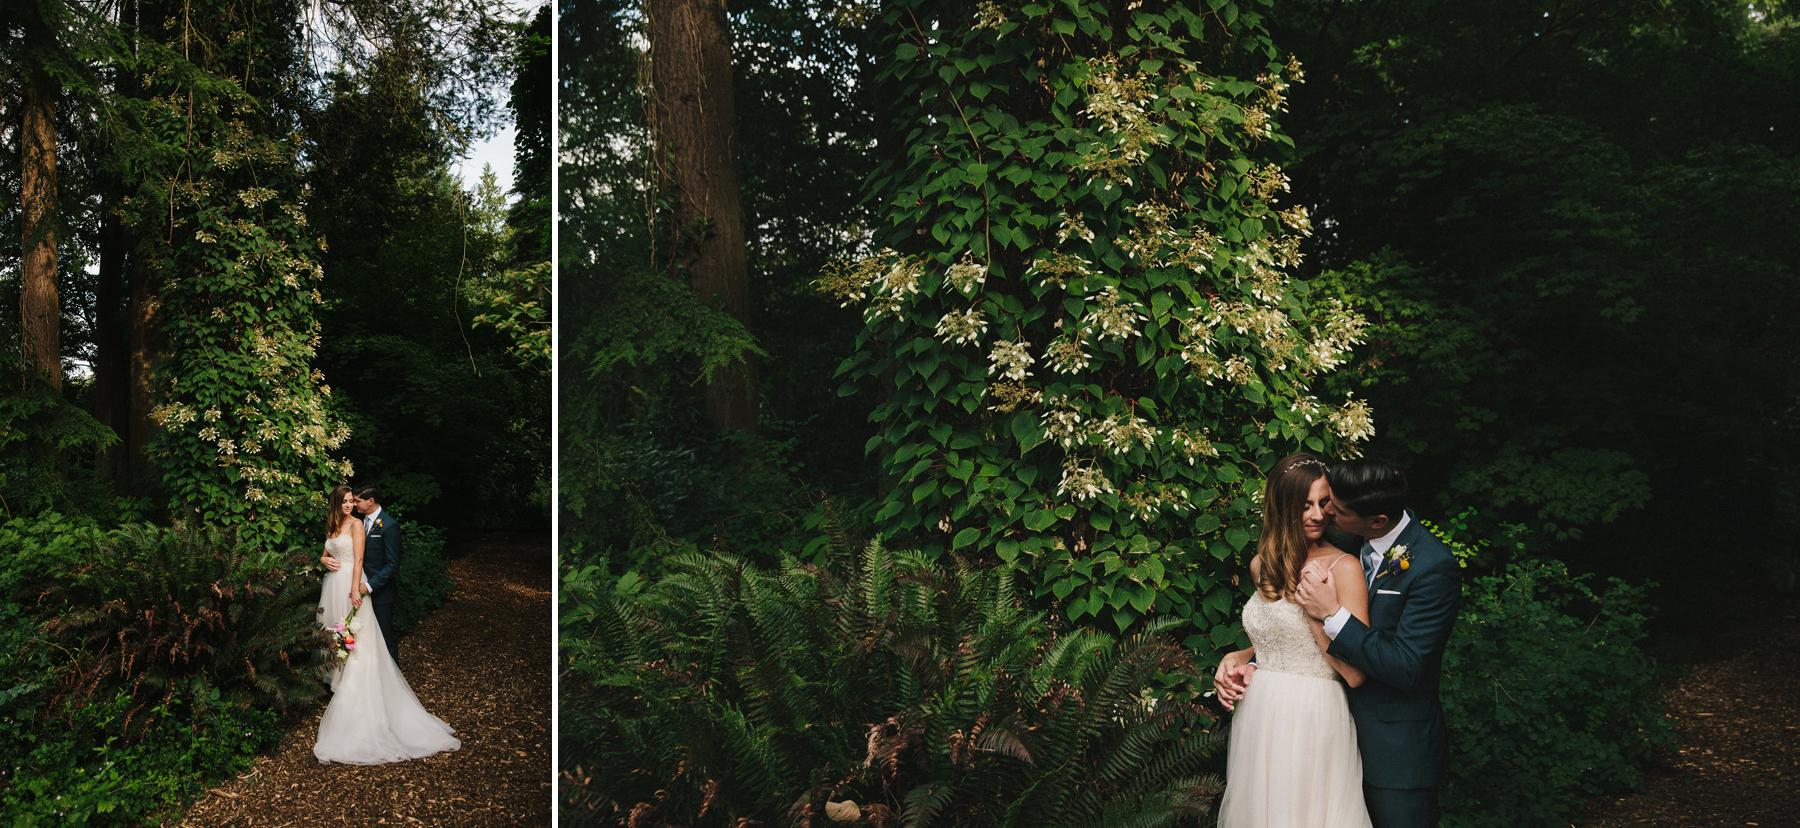 UBC-Botanical-Garden-Wedding-AD-066.jpg